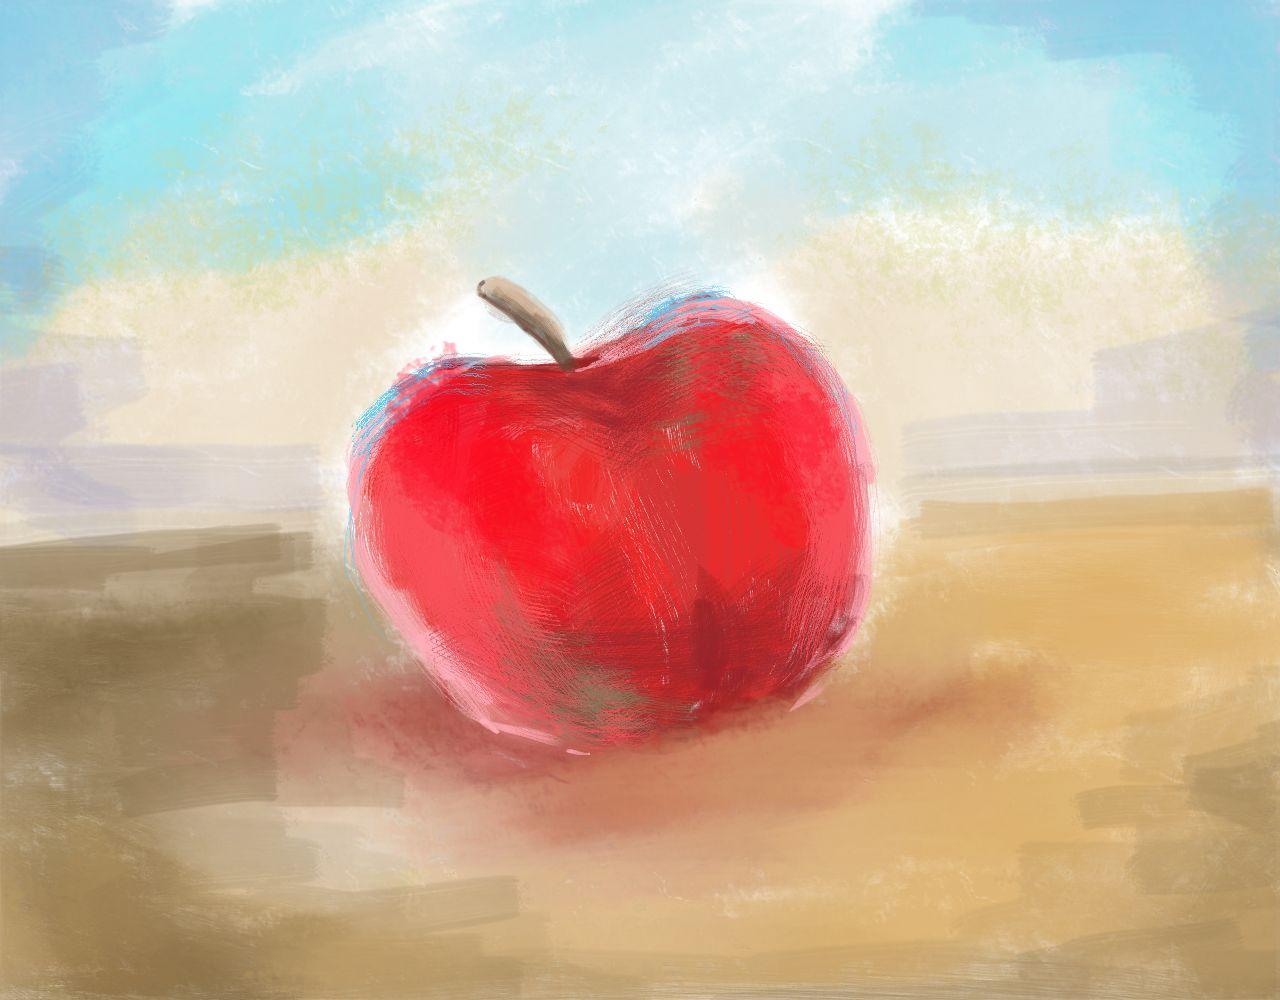 Boring Apple